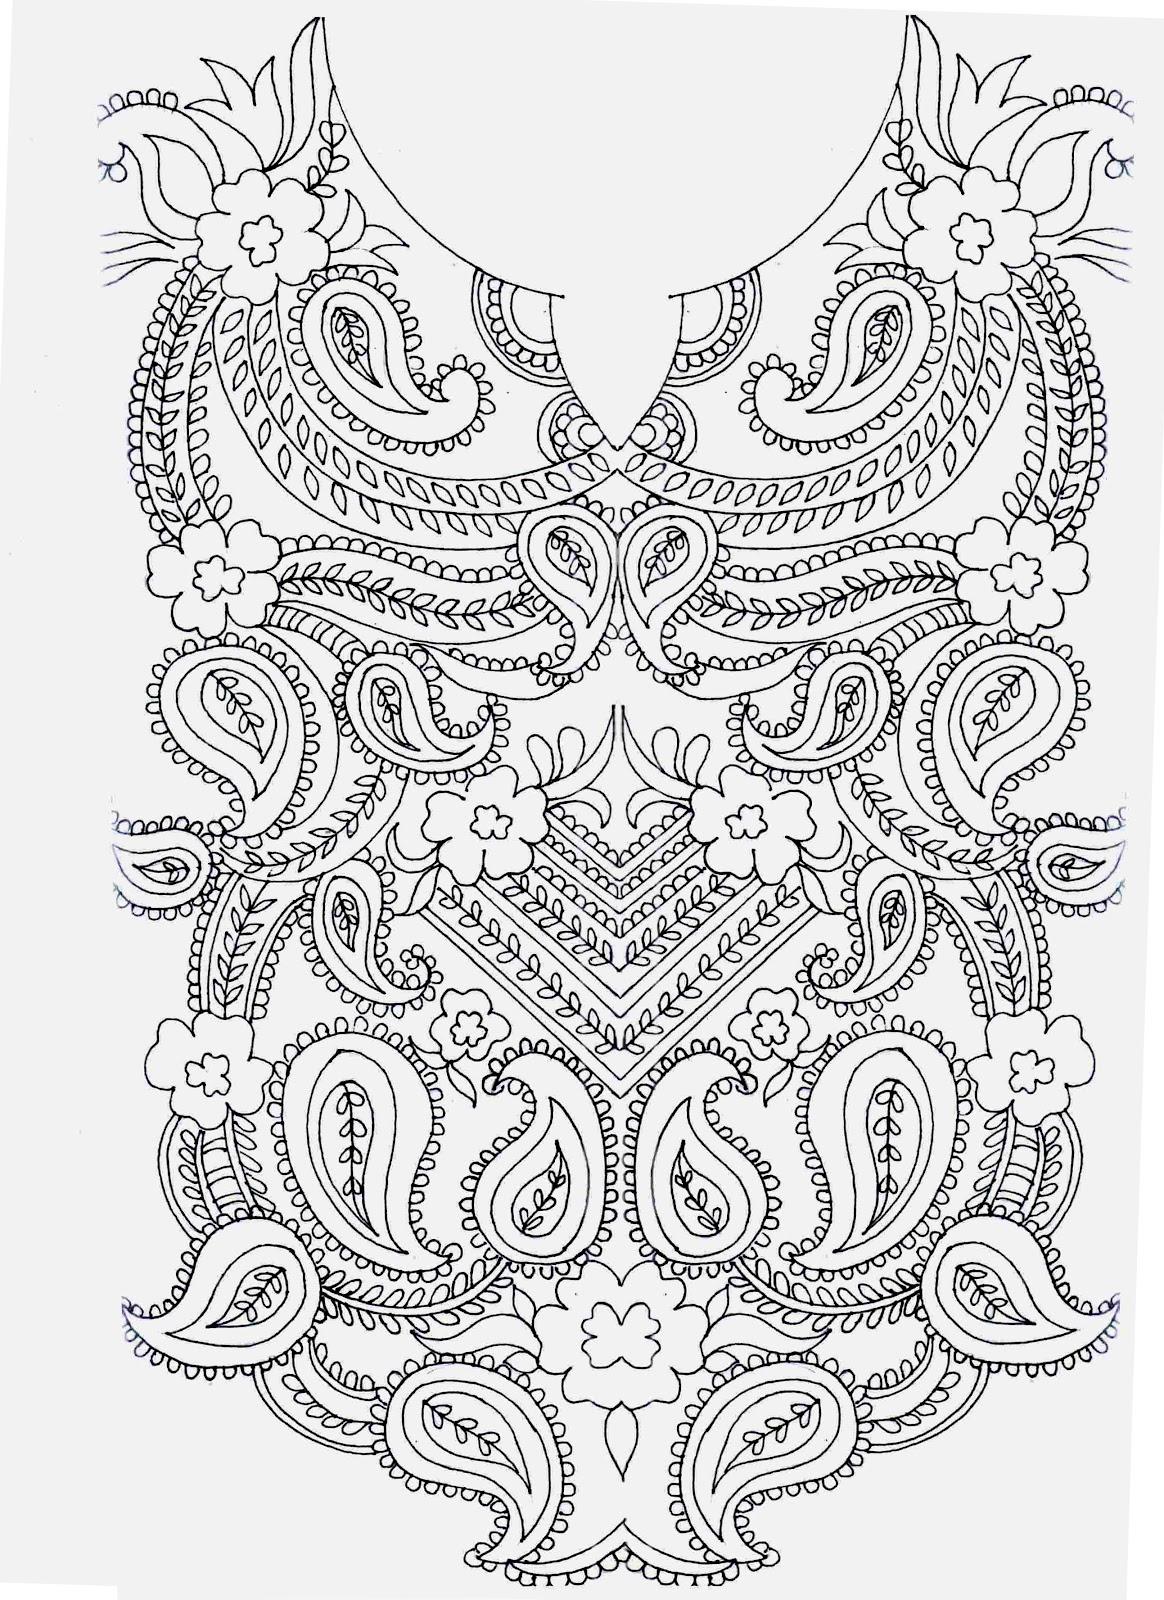 Embdesigntube embroidery sketches shared by sarika agarwal